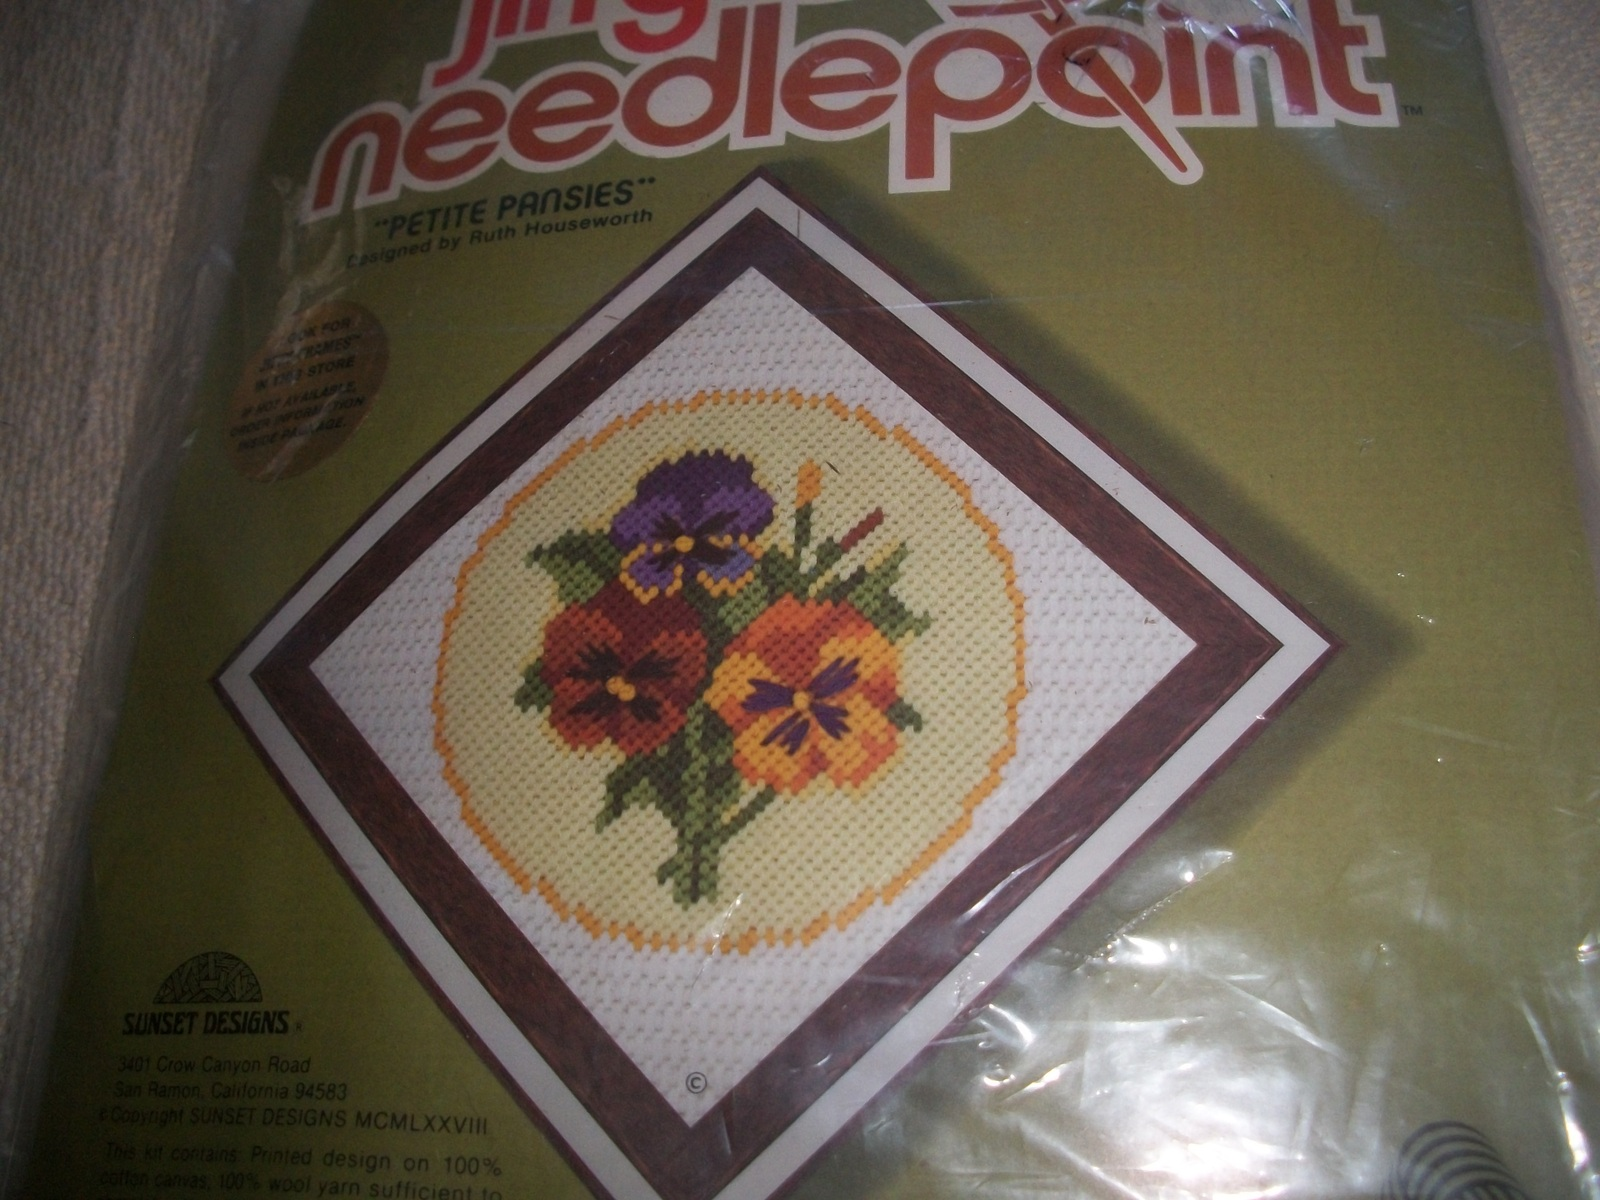 Petite Pansies Needlepoint Kit - $20.00